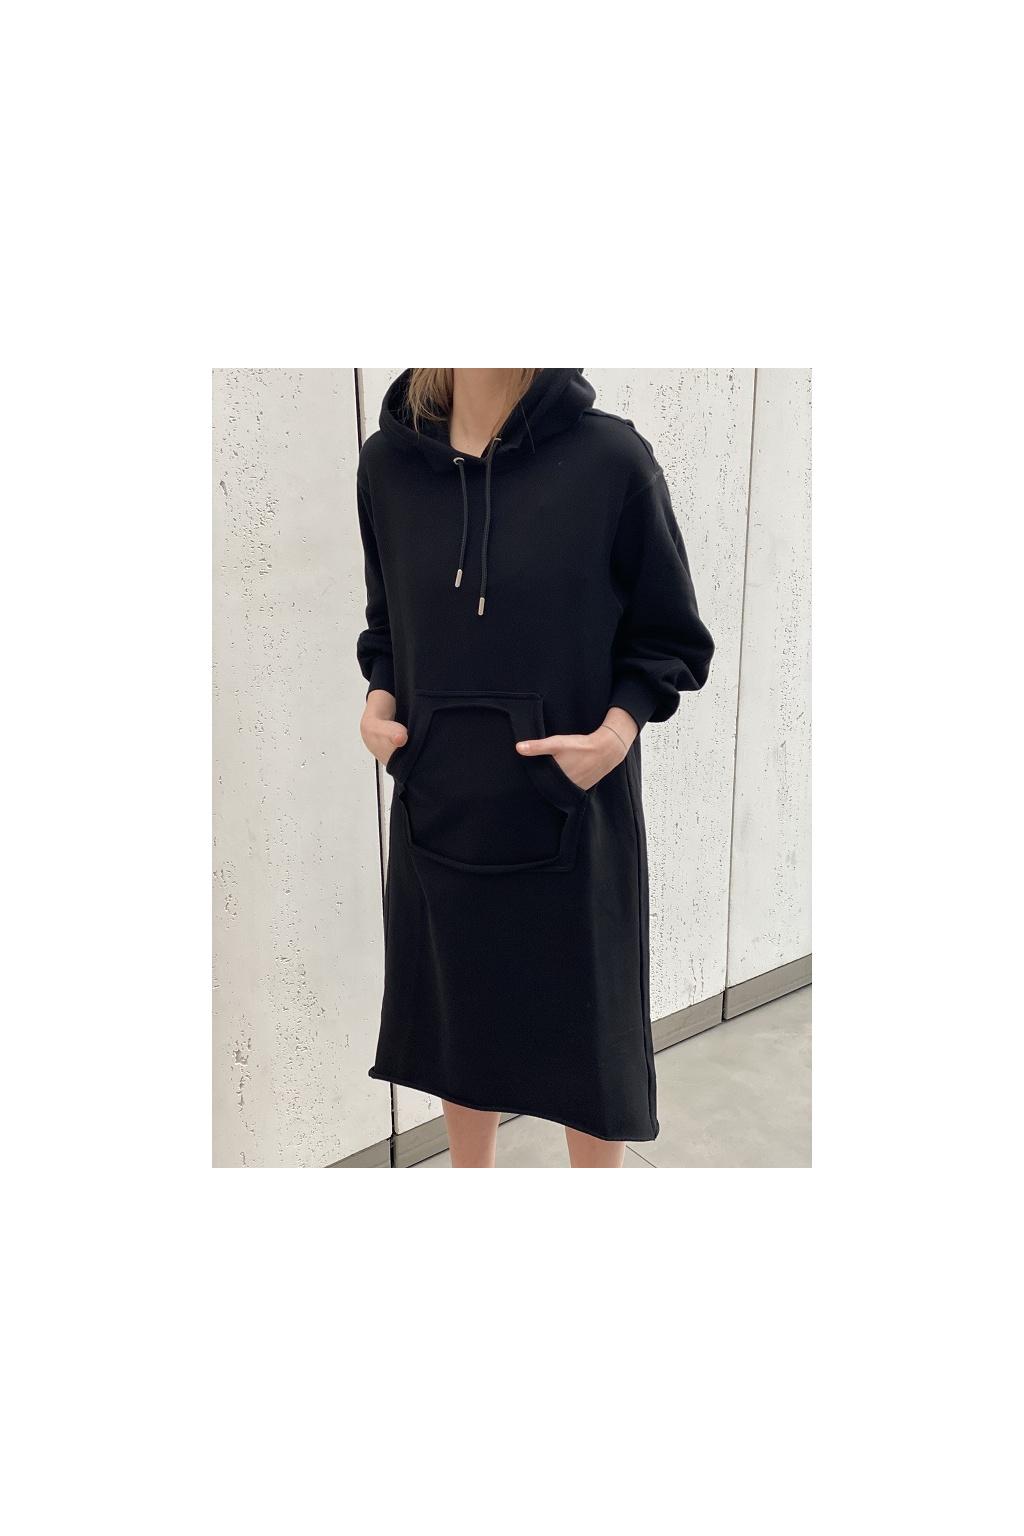 A04457 0IAJH 9XX Dámské šaty Diesel D Ilse Twist Raw Copy černé